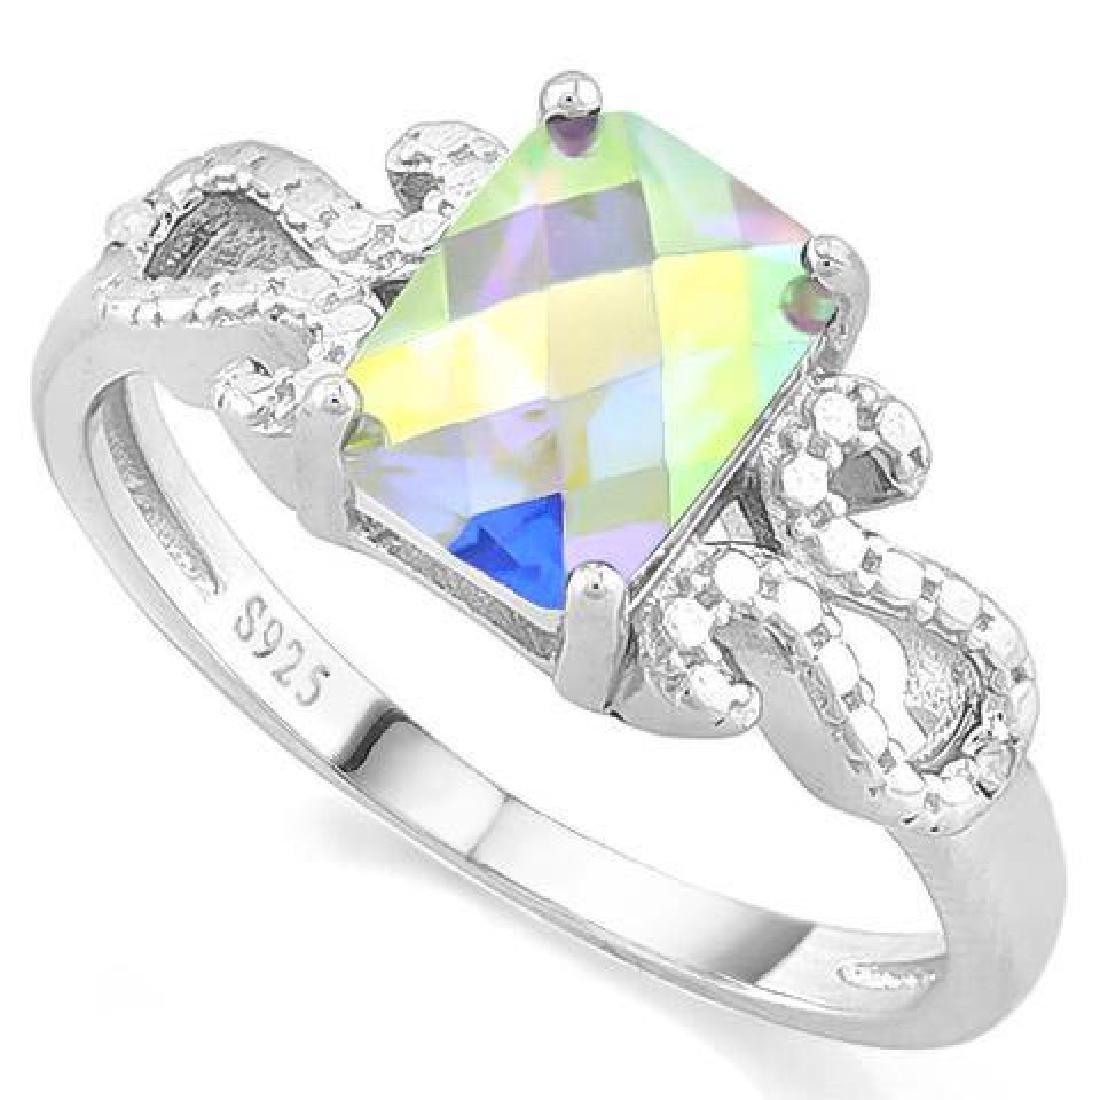 1 1/3 CARAT MERCURY MYSTIC TOPAZ DIAMOND 925 STERLING S